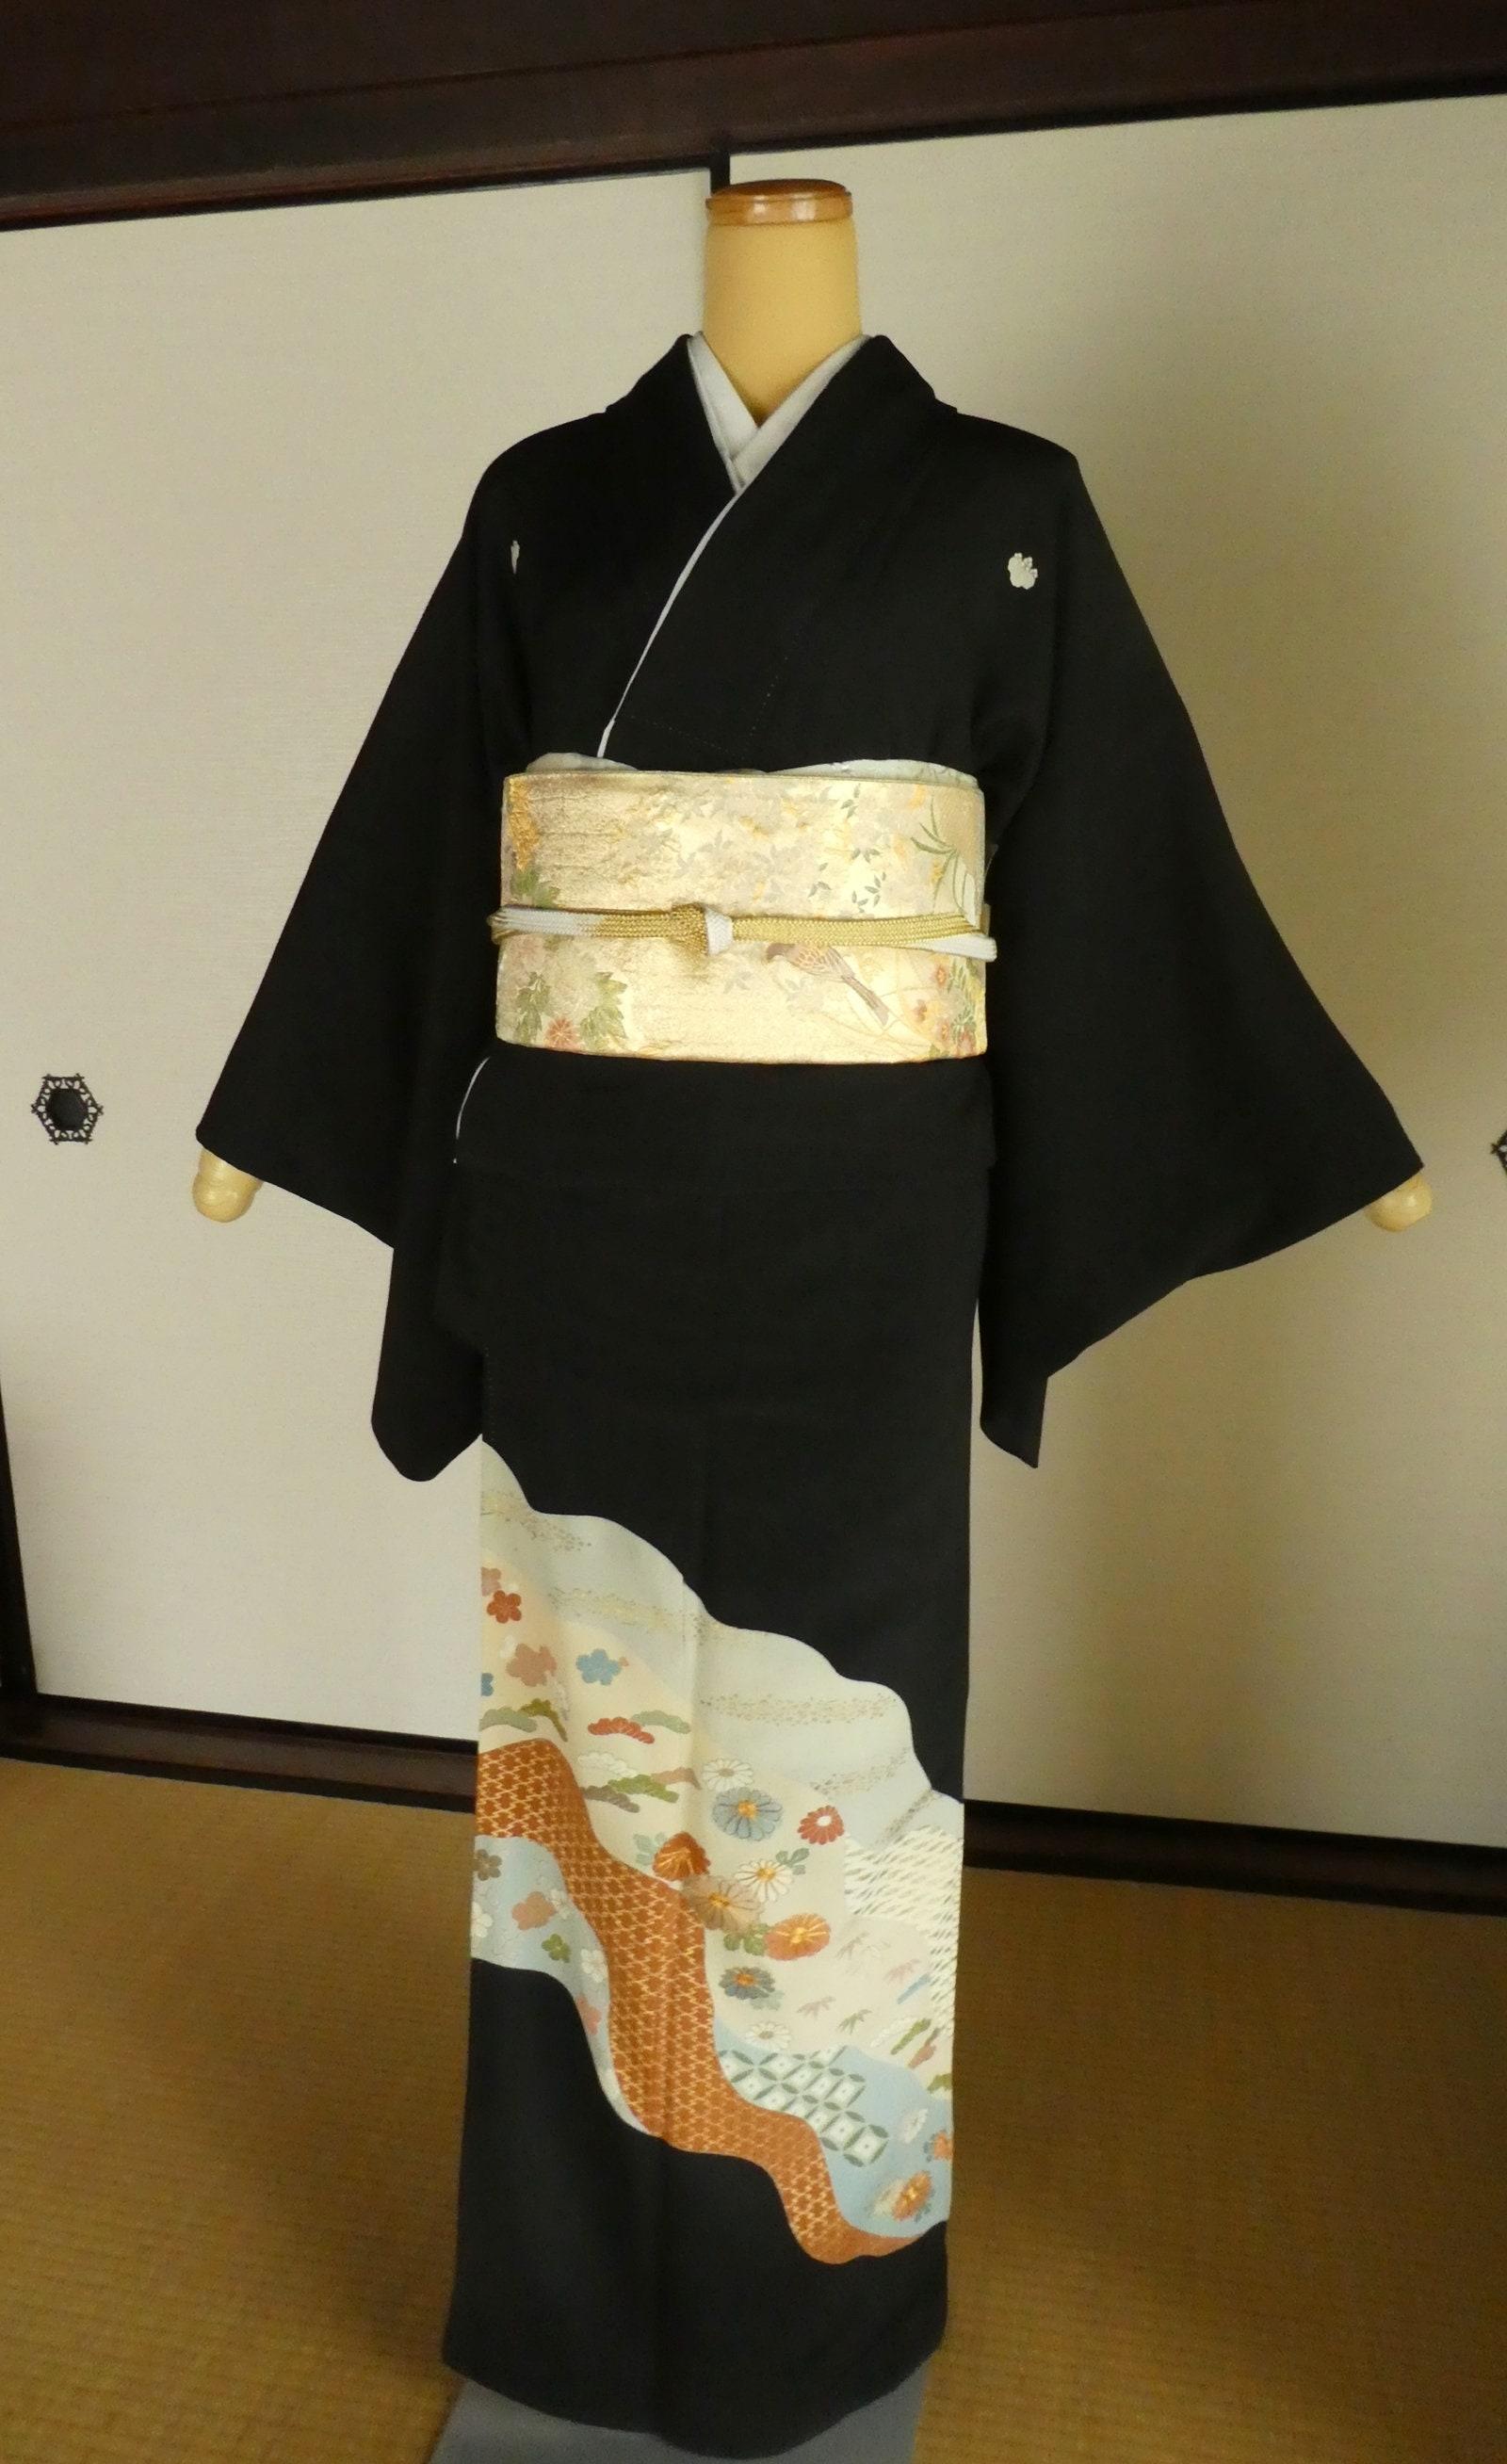 dbb6c9b06 KURO-TOMESODE Kimono kawaii design 161cm black formal Yuki | Etsy